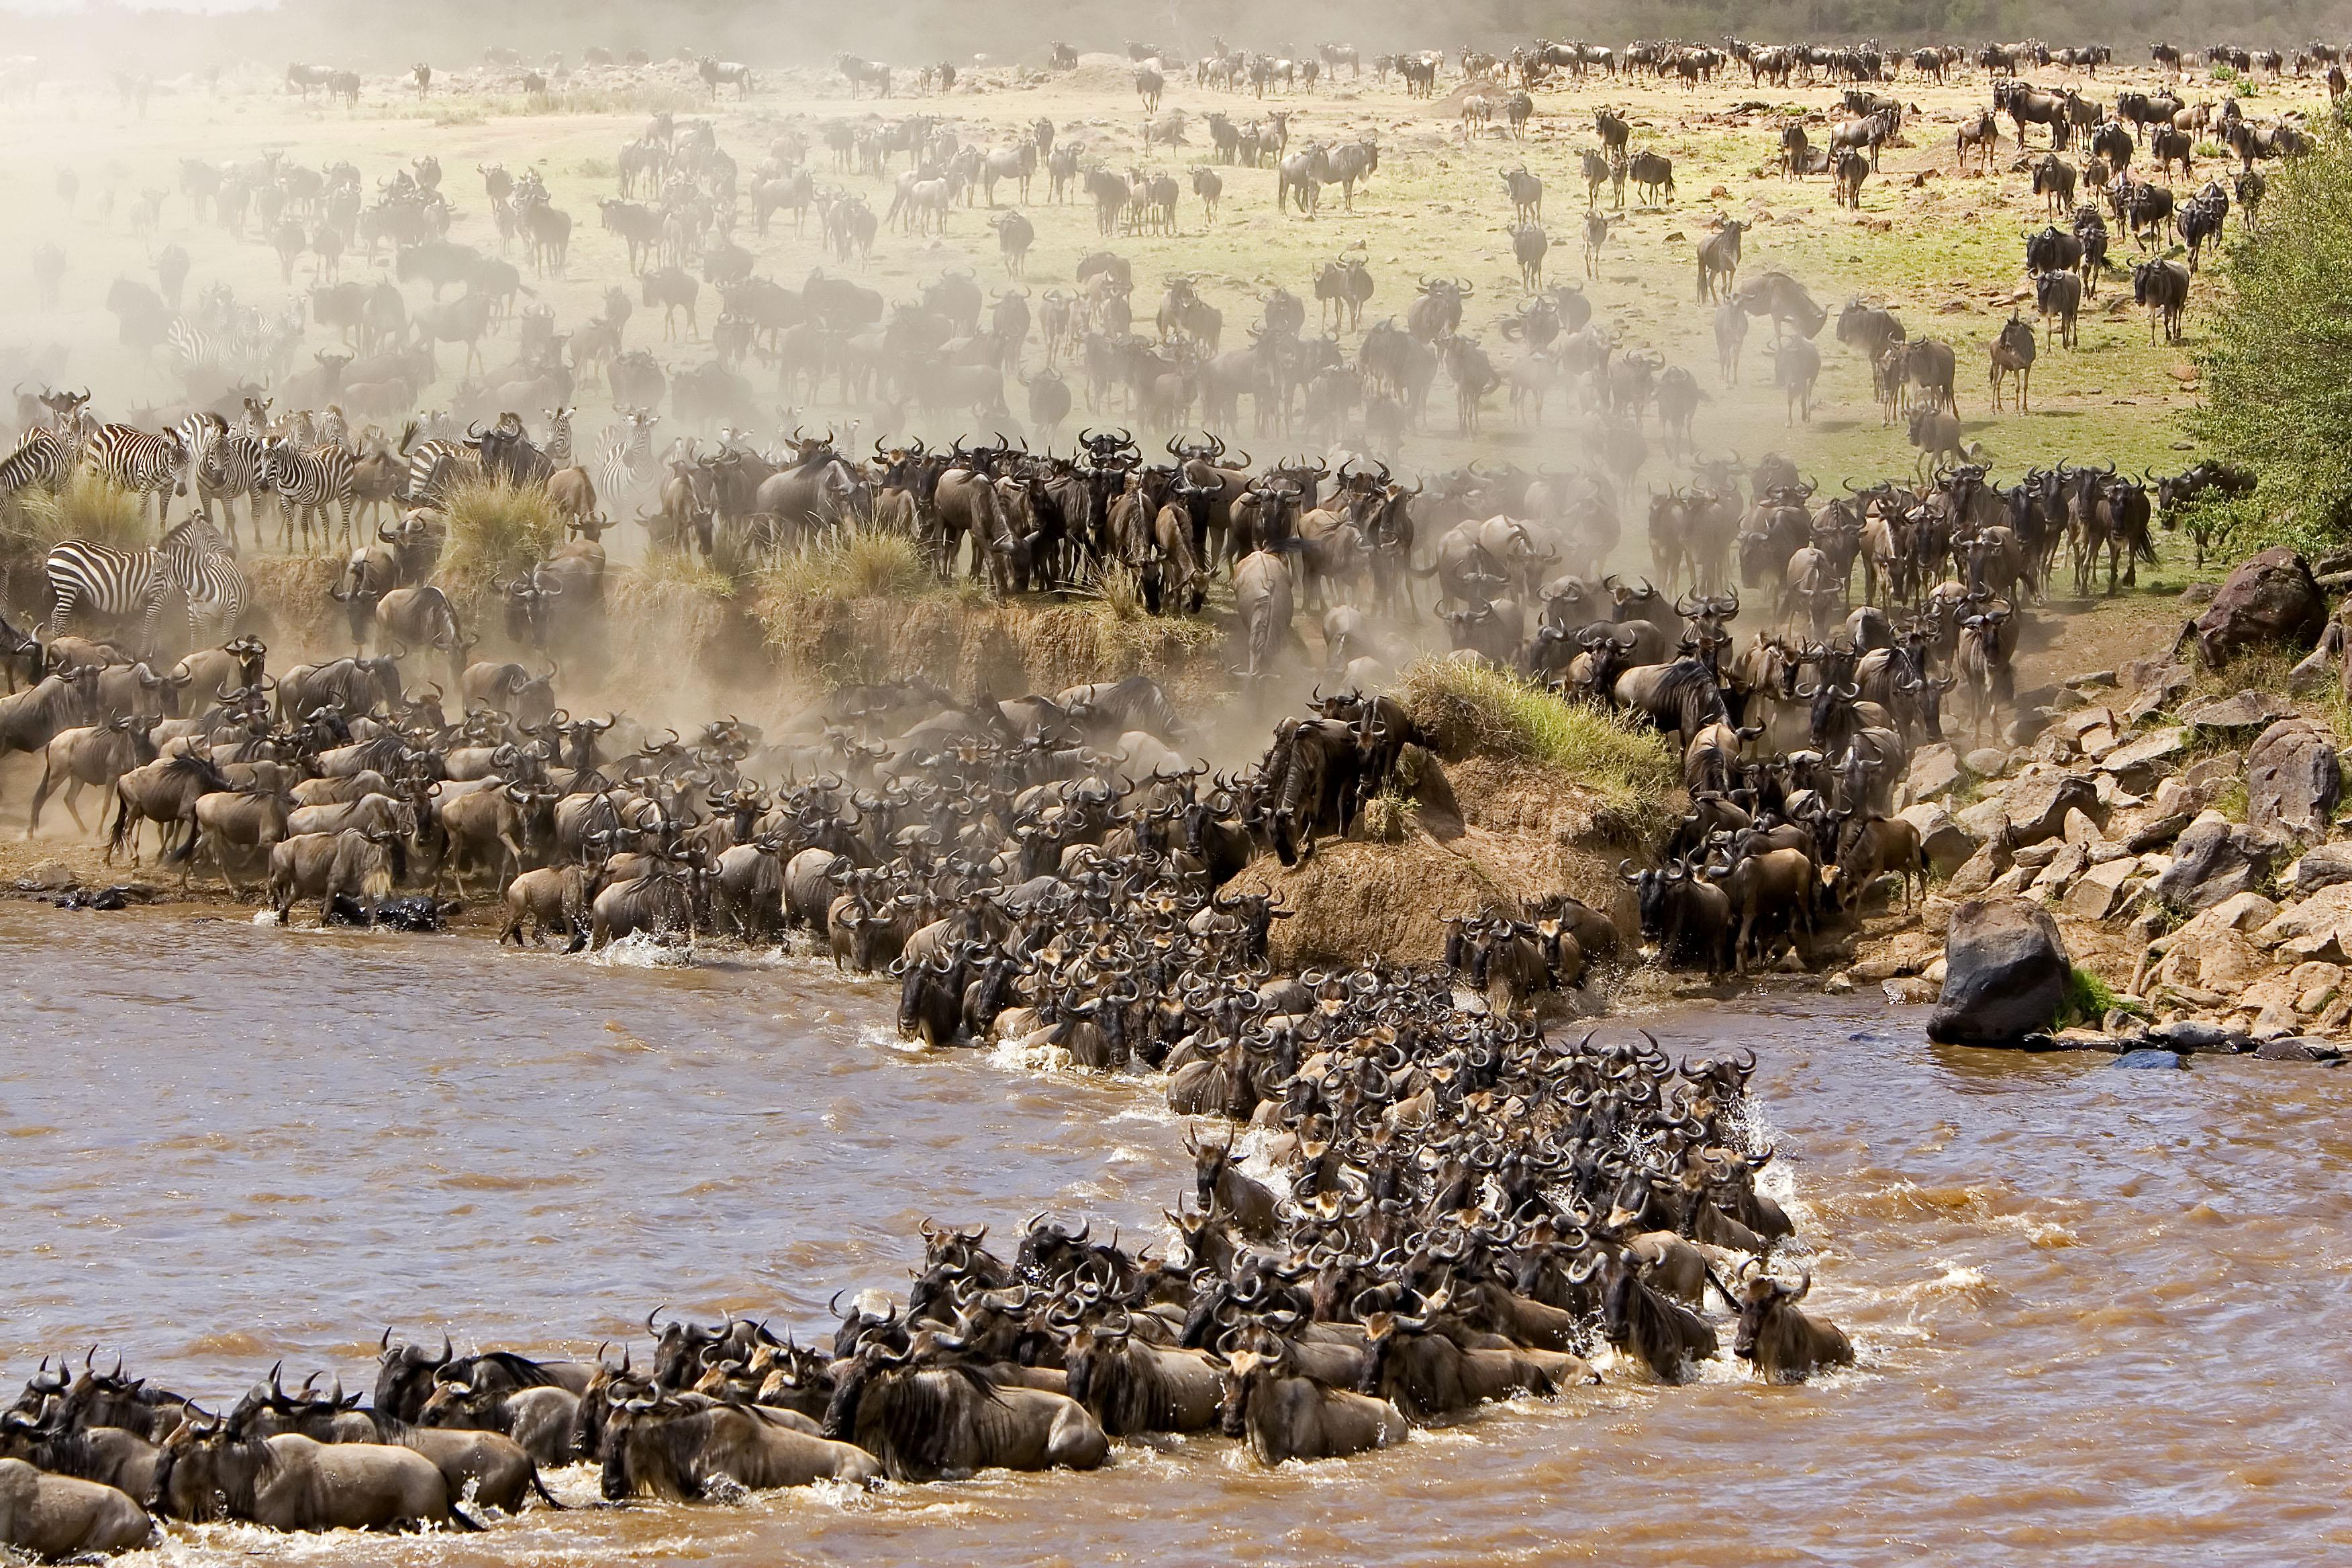 Serengeti Wildebeest Migration Tanzania